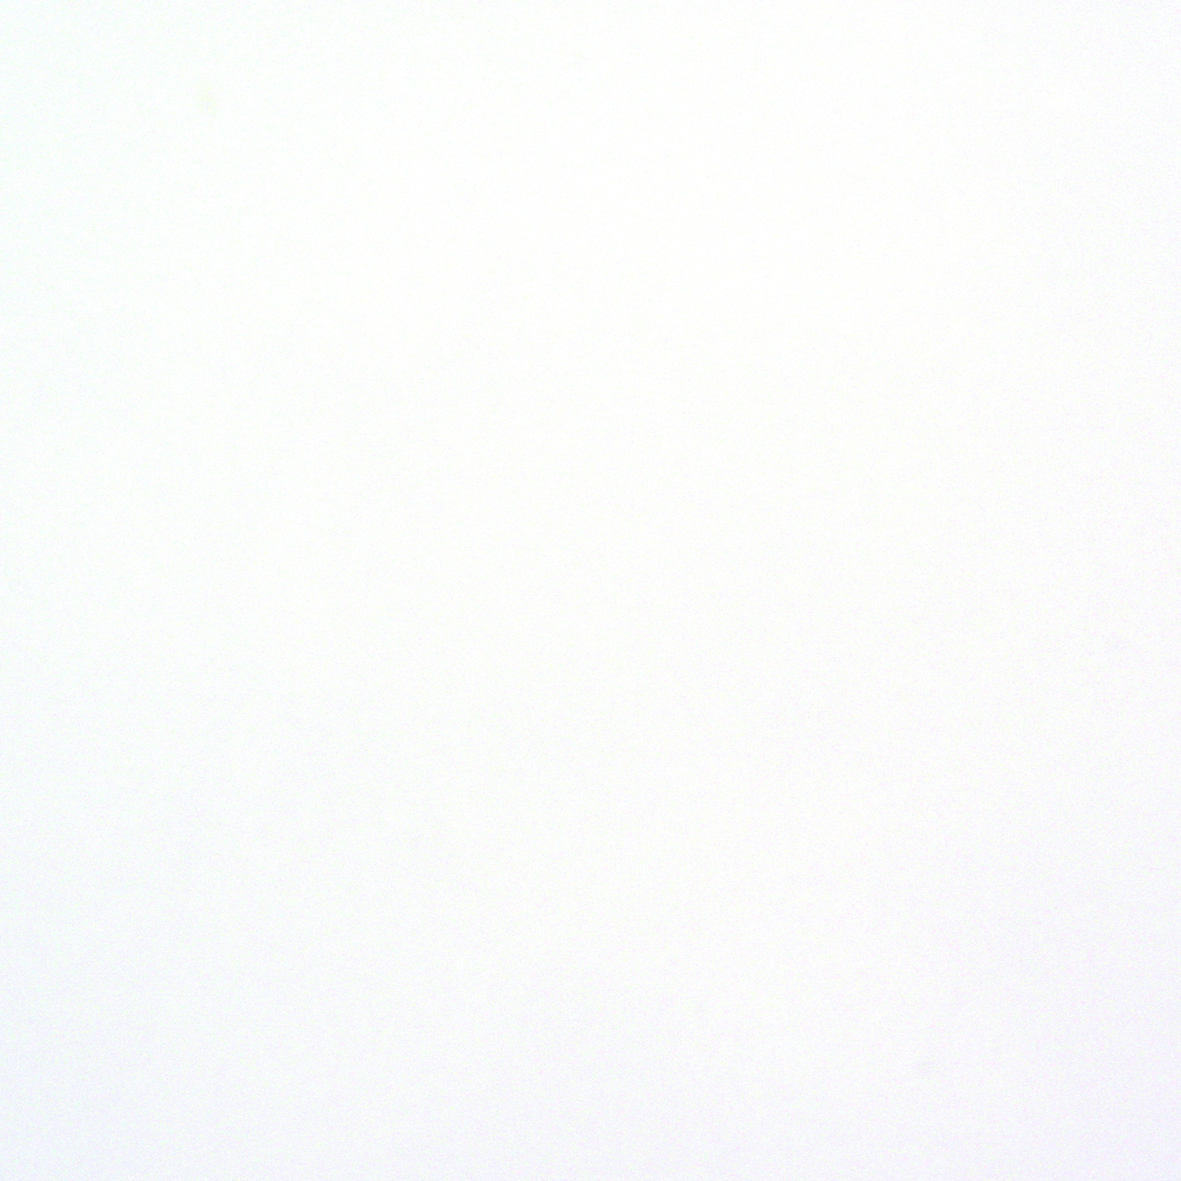 Hvid blank